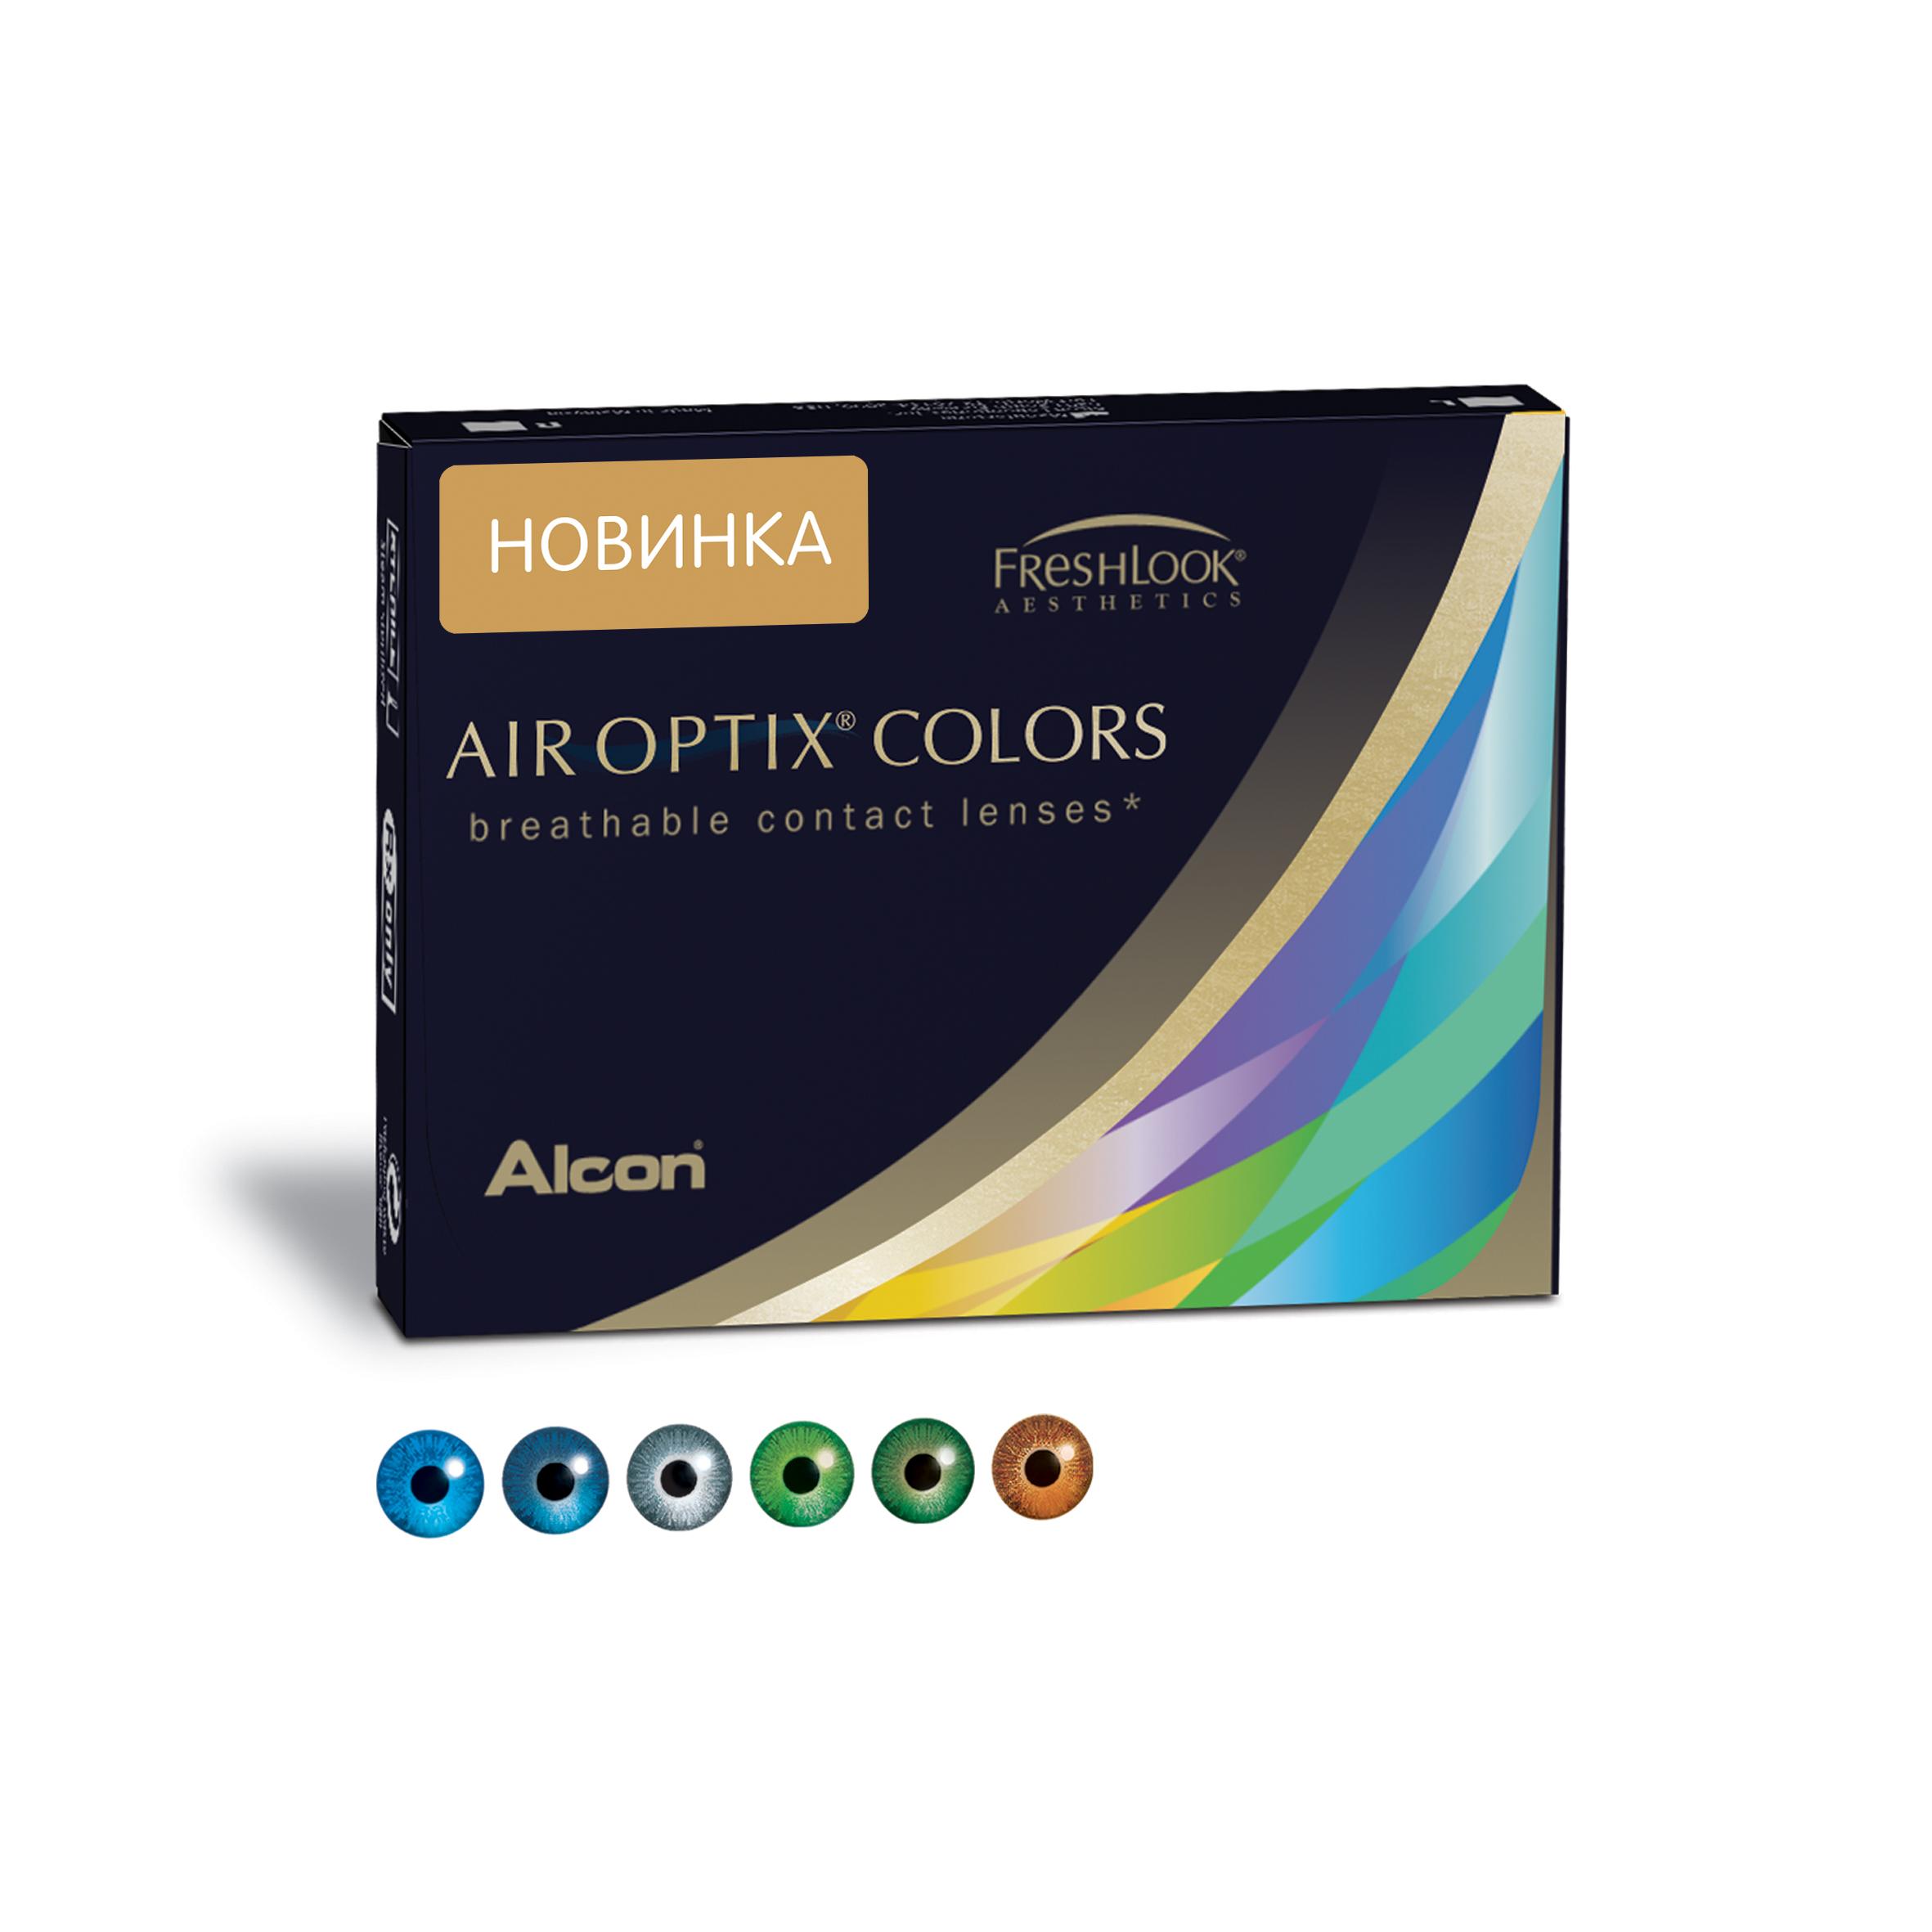 Аlcon контактные линзы Air Optix Colors 2 шт -4.25 Green31746243Мягкие контактные линзы